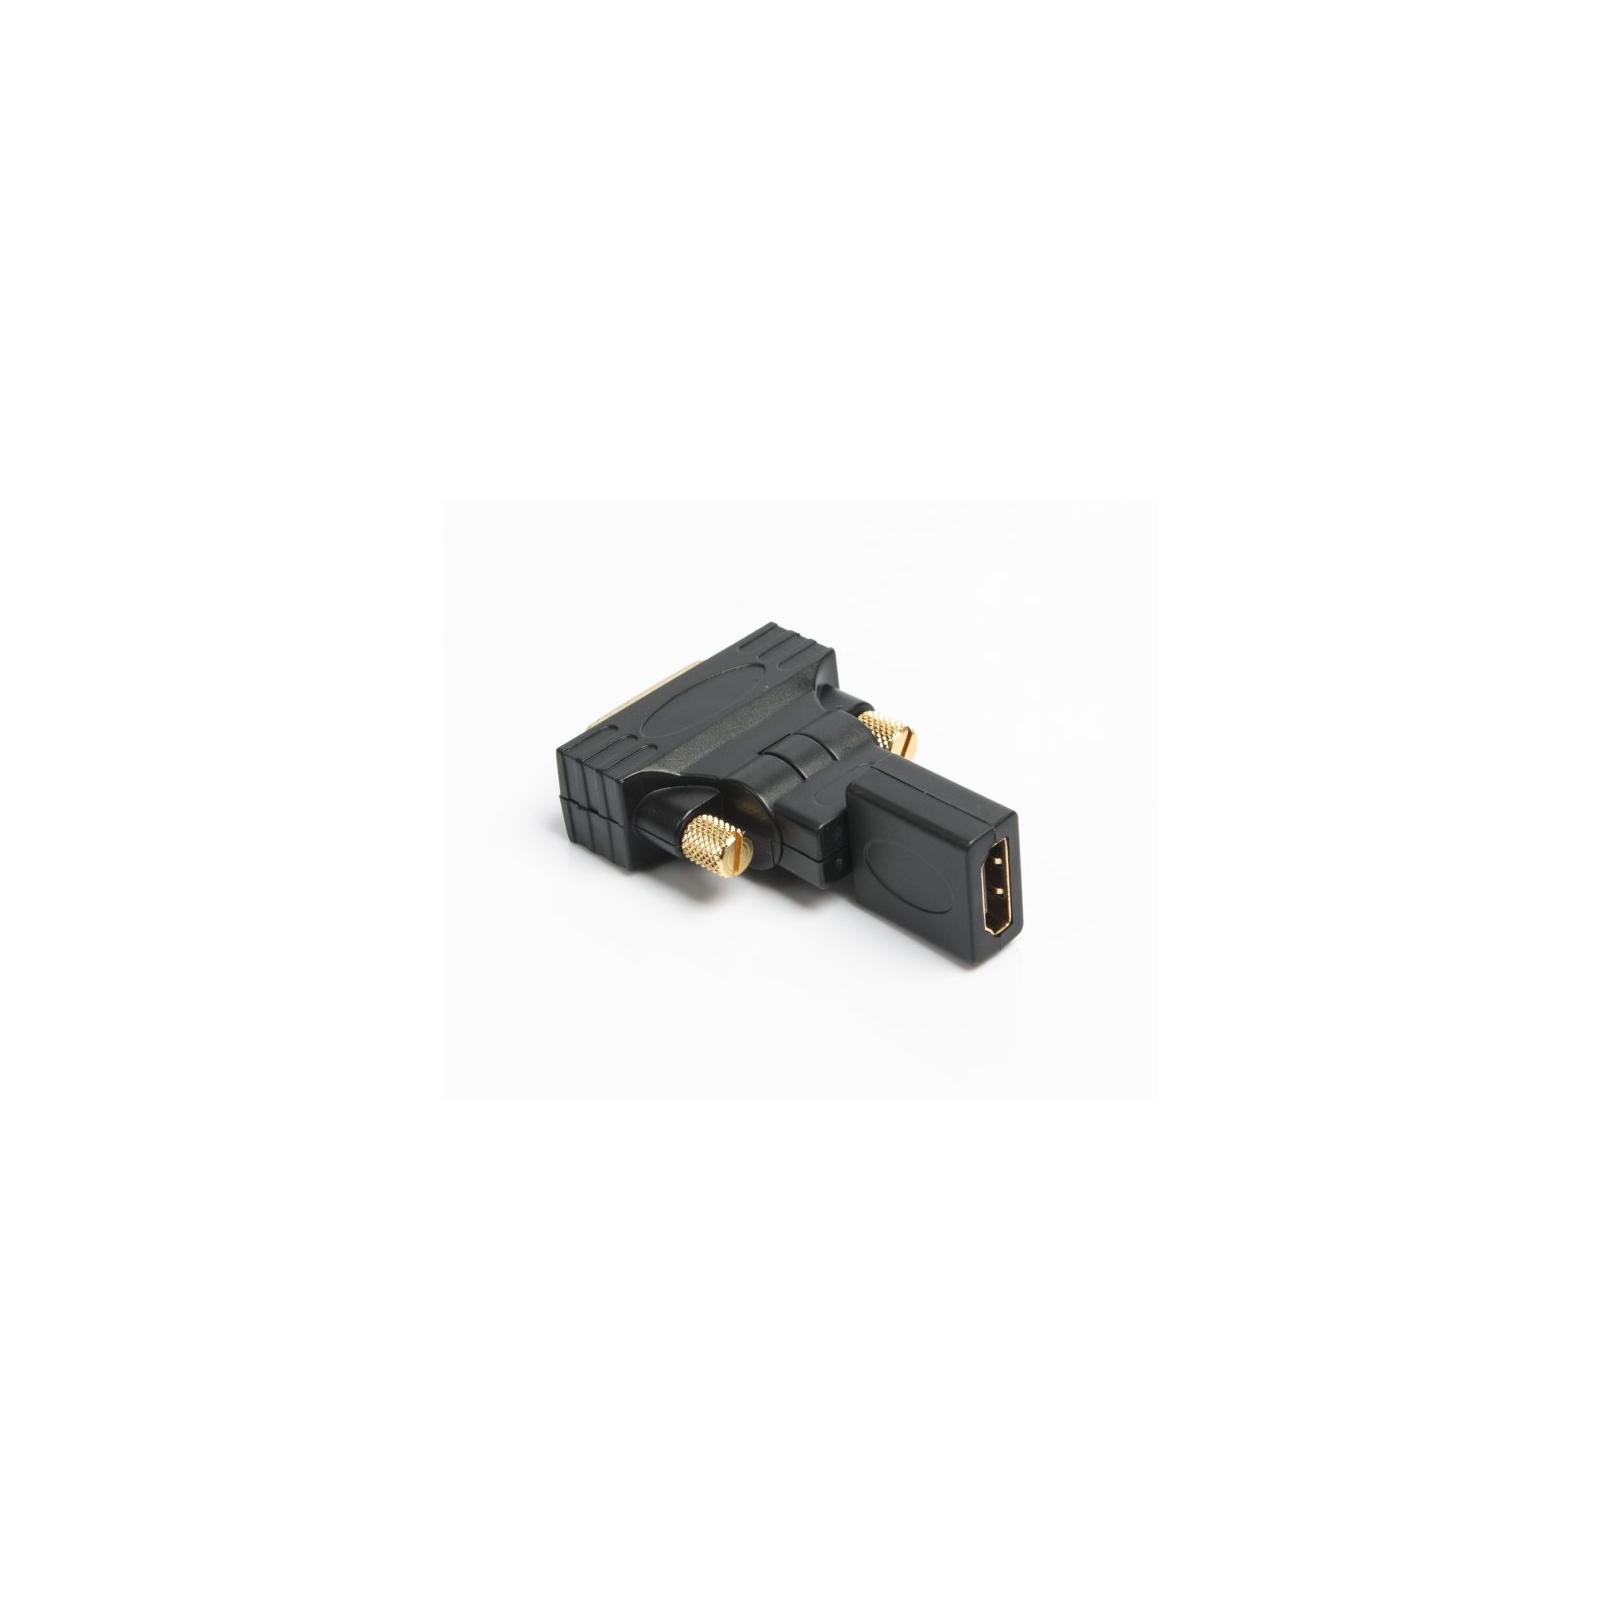 Переходник HDMI AF to DVI M (24+1) Viewcon (VD 038 B) изображение 3